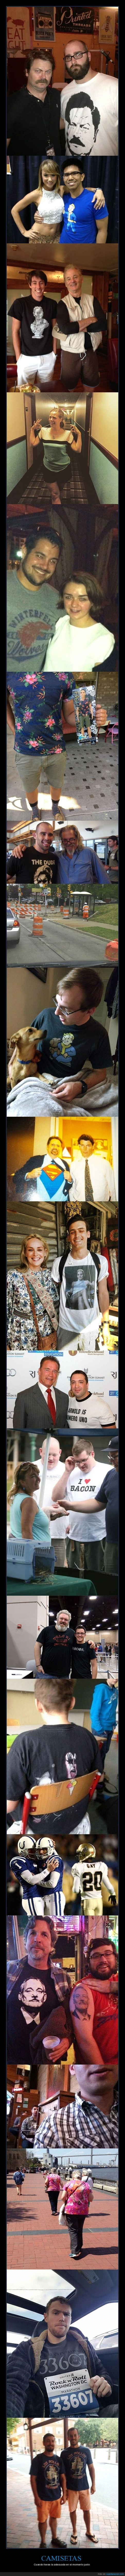 adecuadas,camisetas,coincidencias